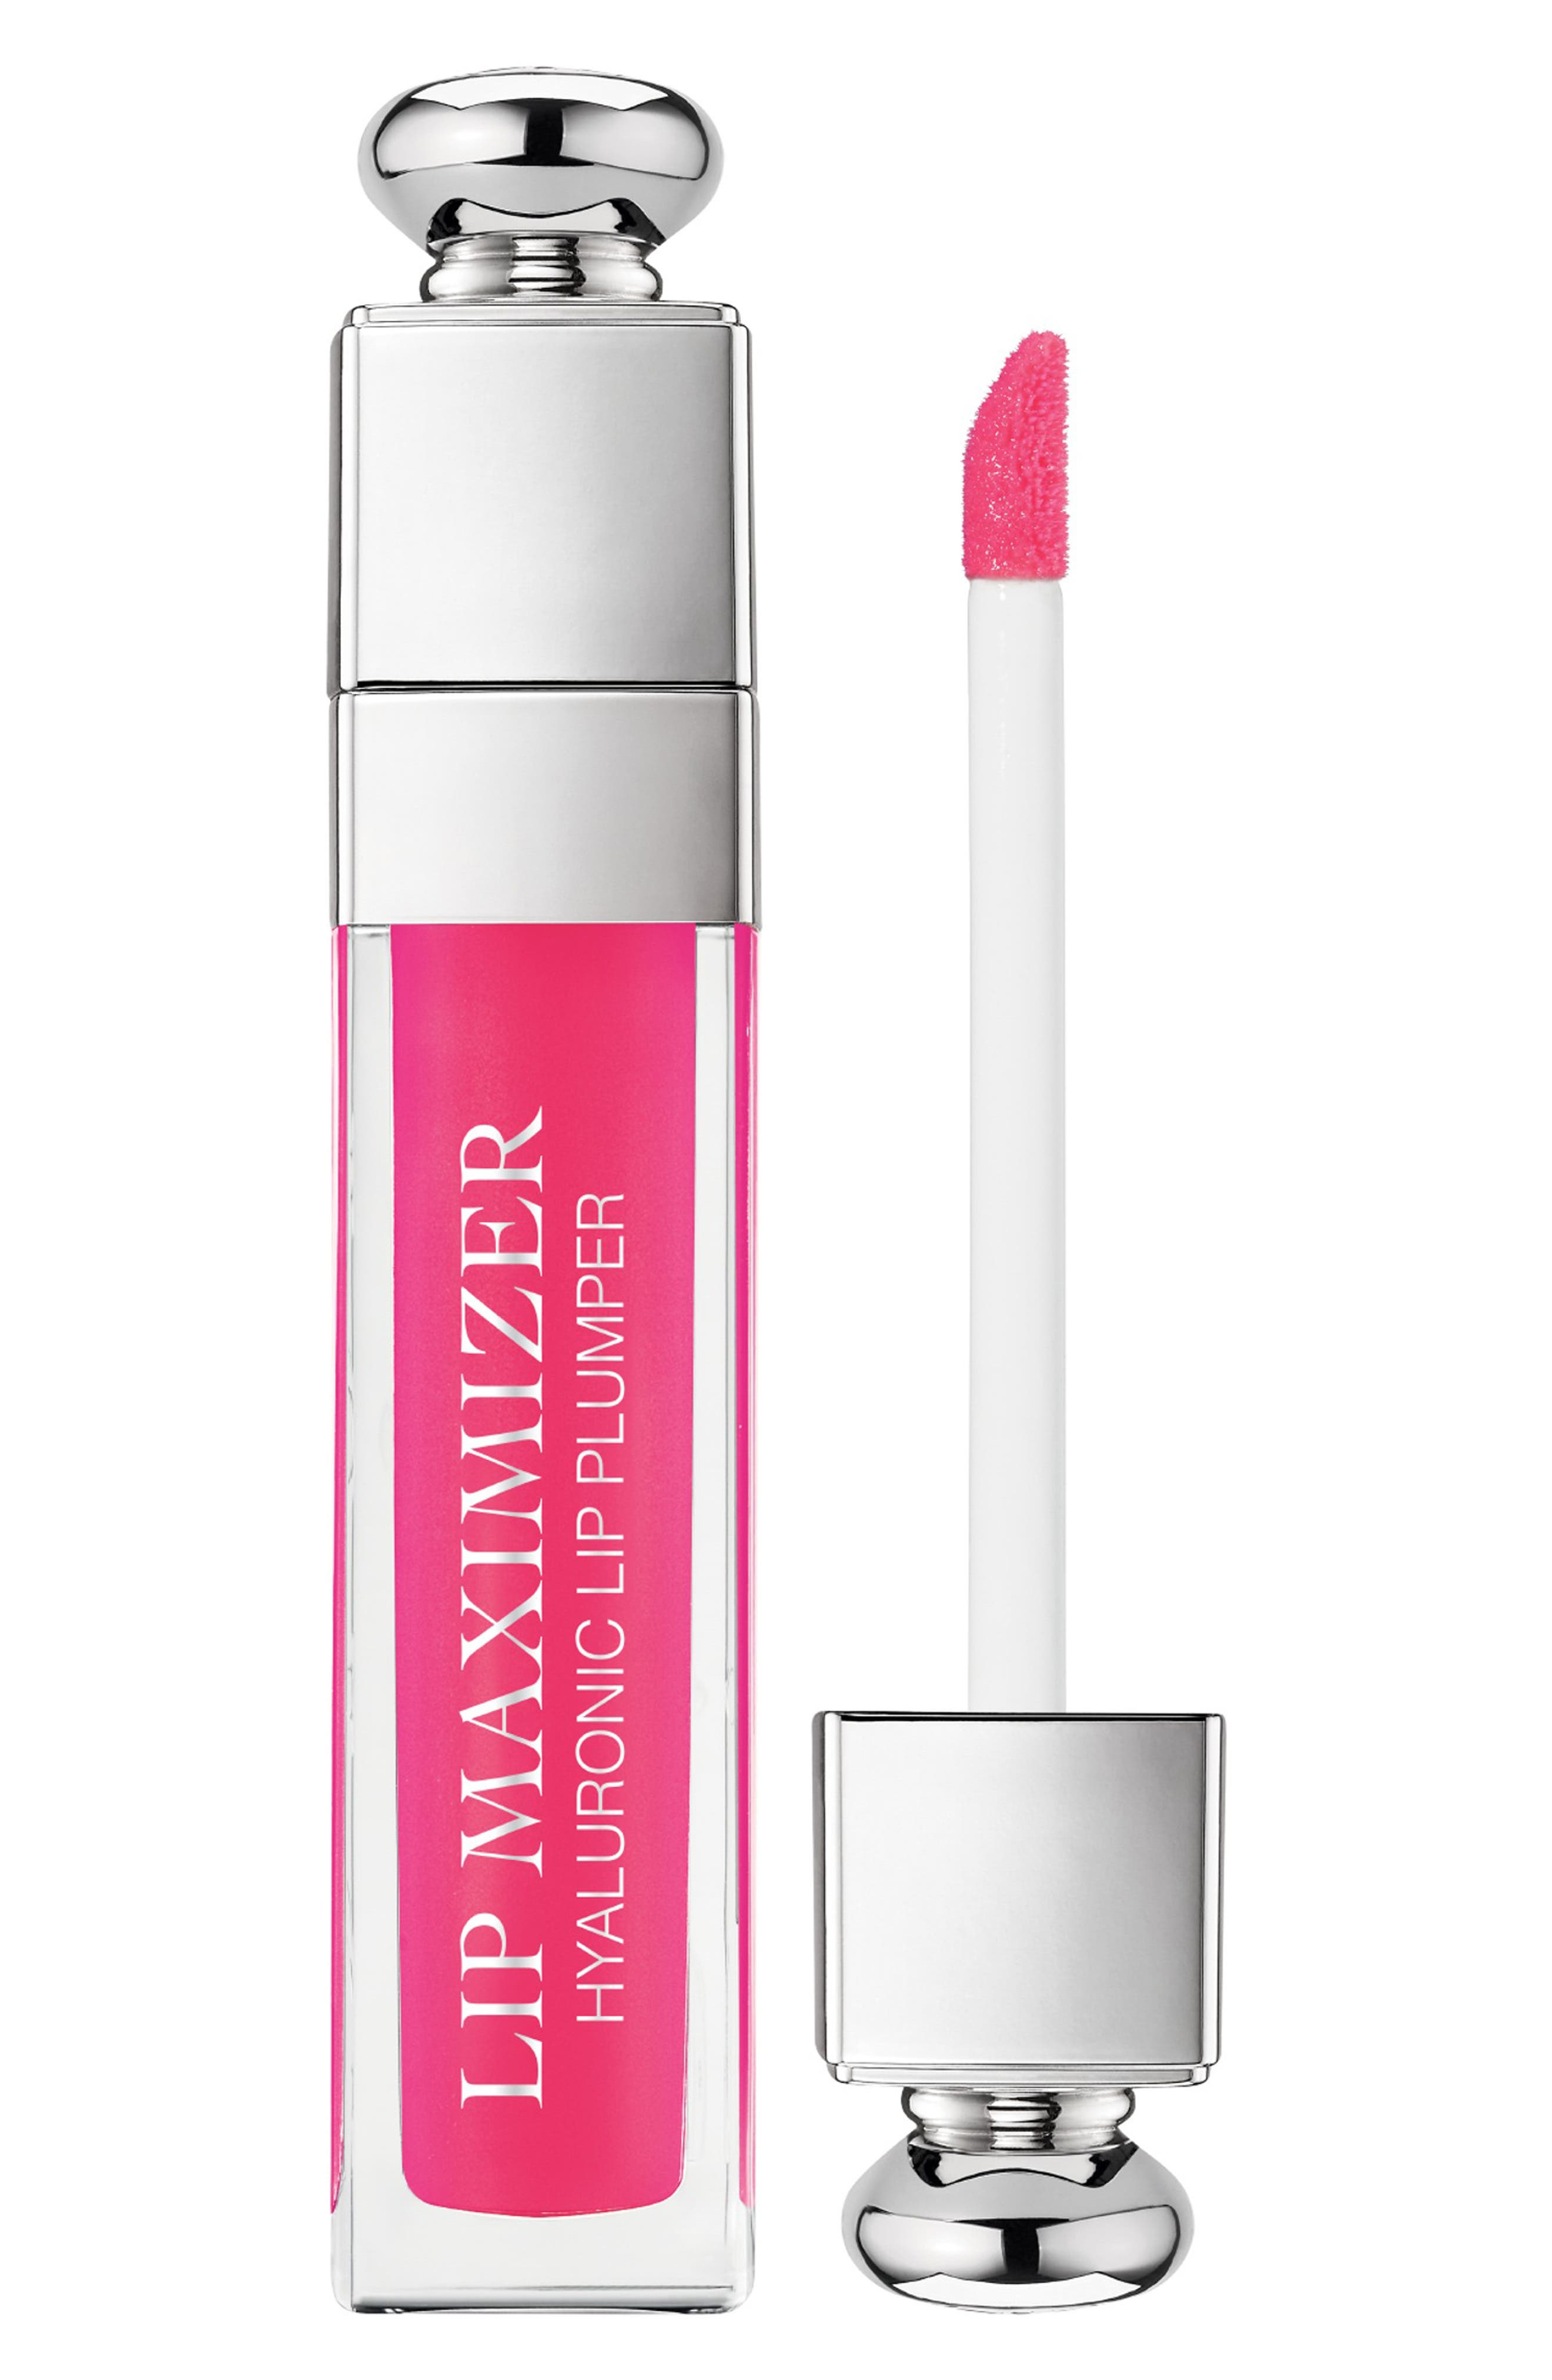 Dior Addict Lip Maximizer - 007 Raspberry/ Glow